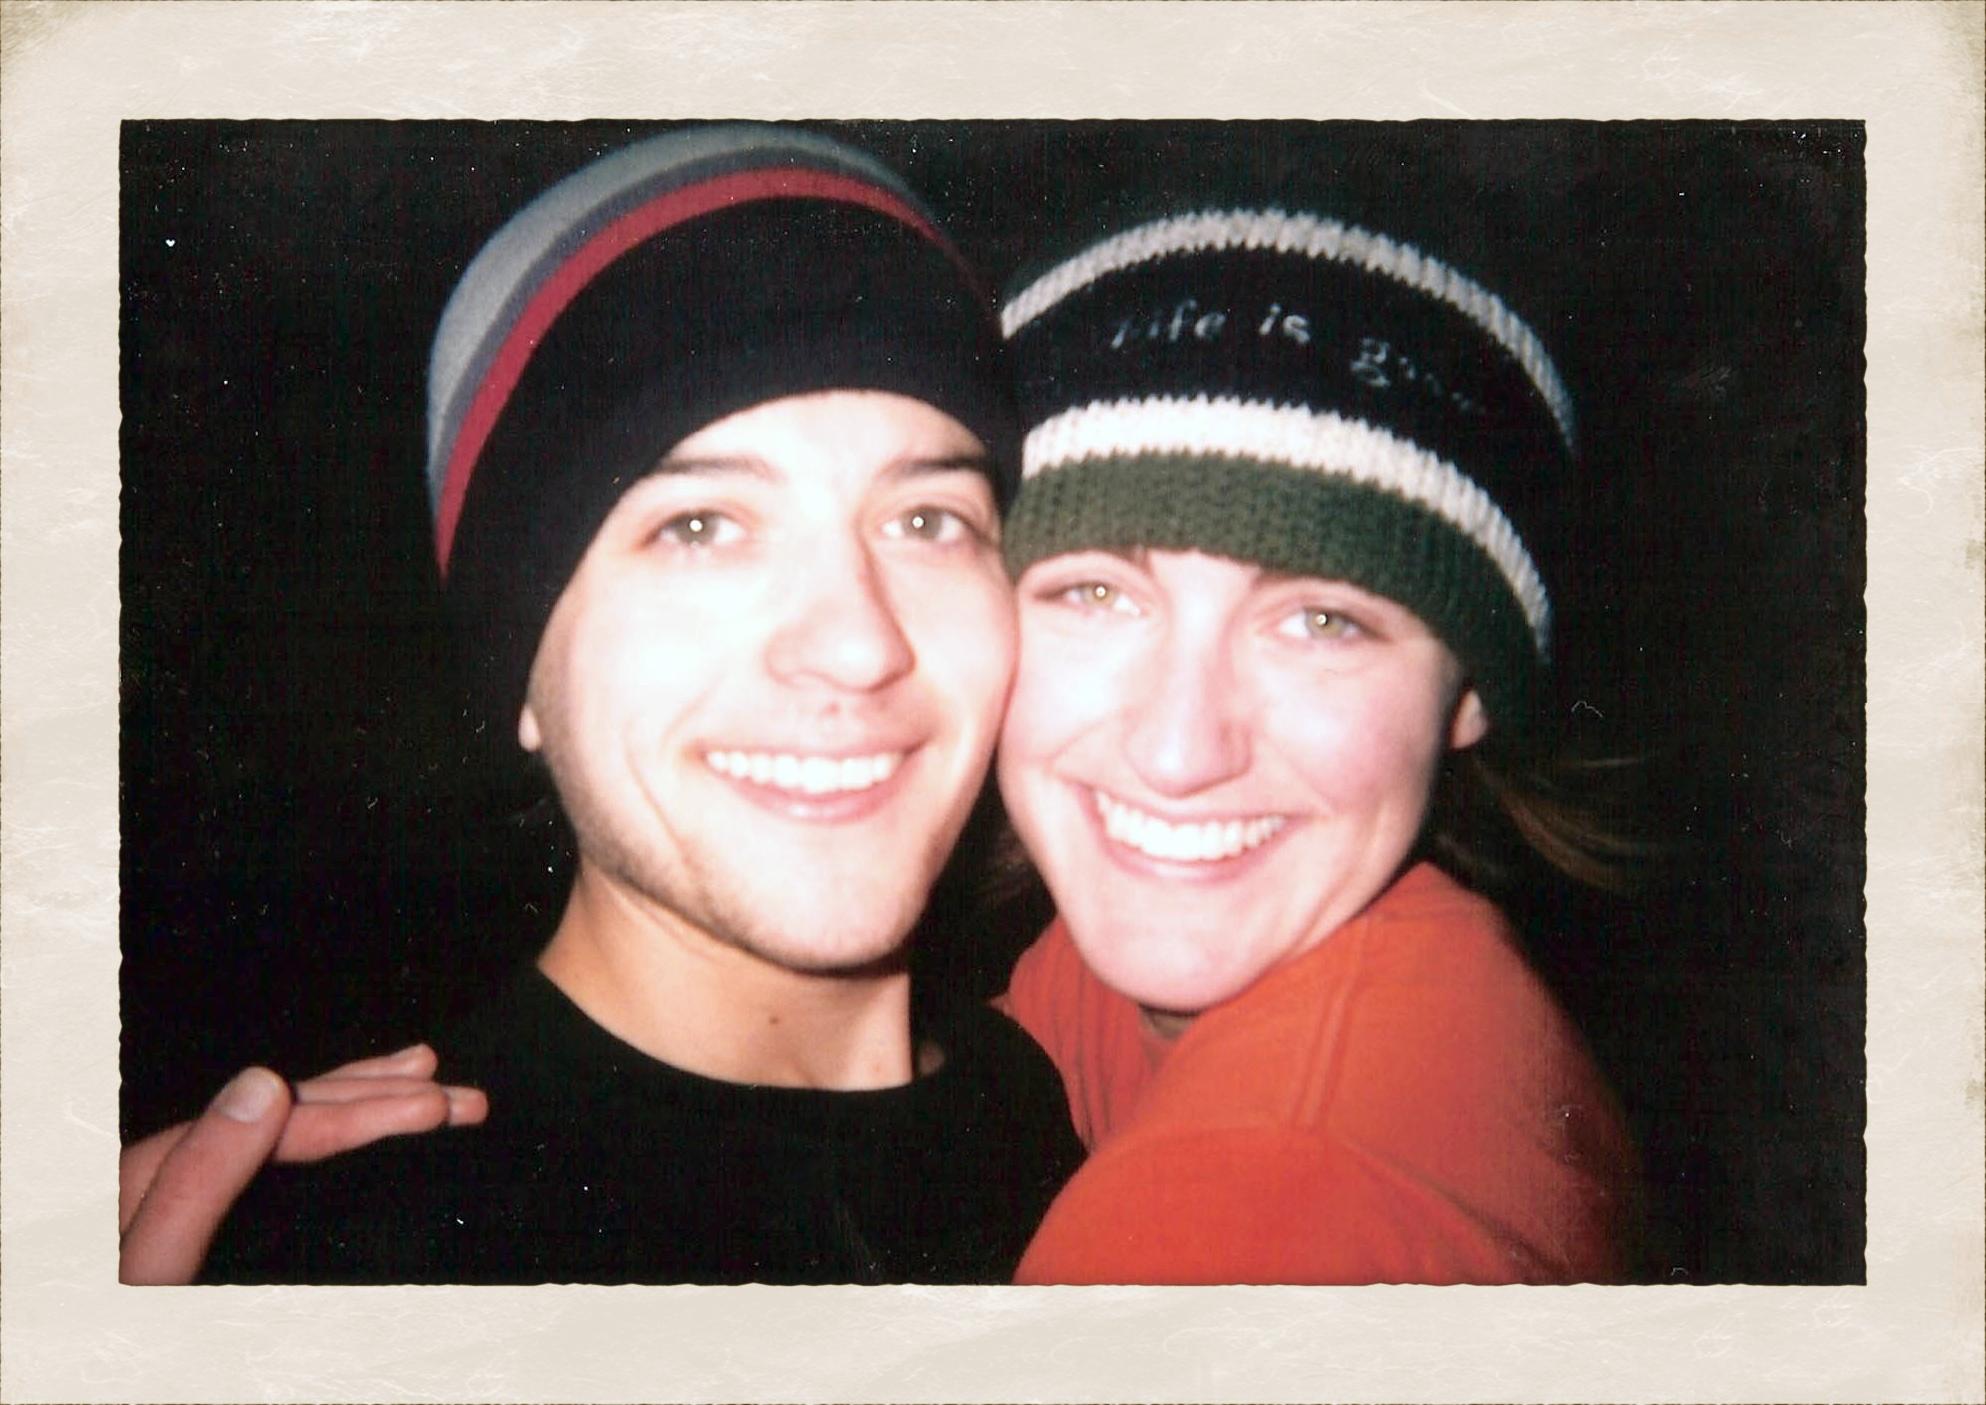 Babies... 14 years ago.